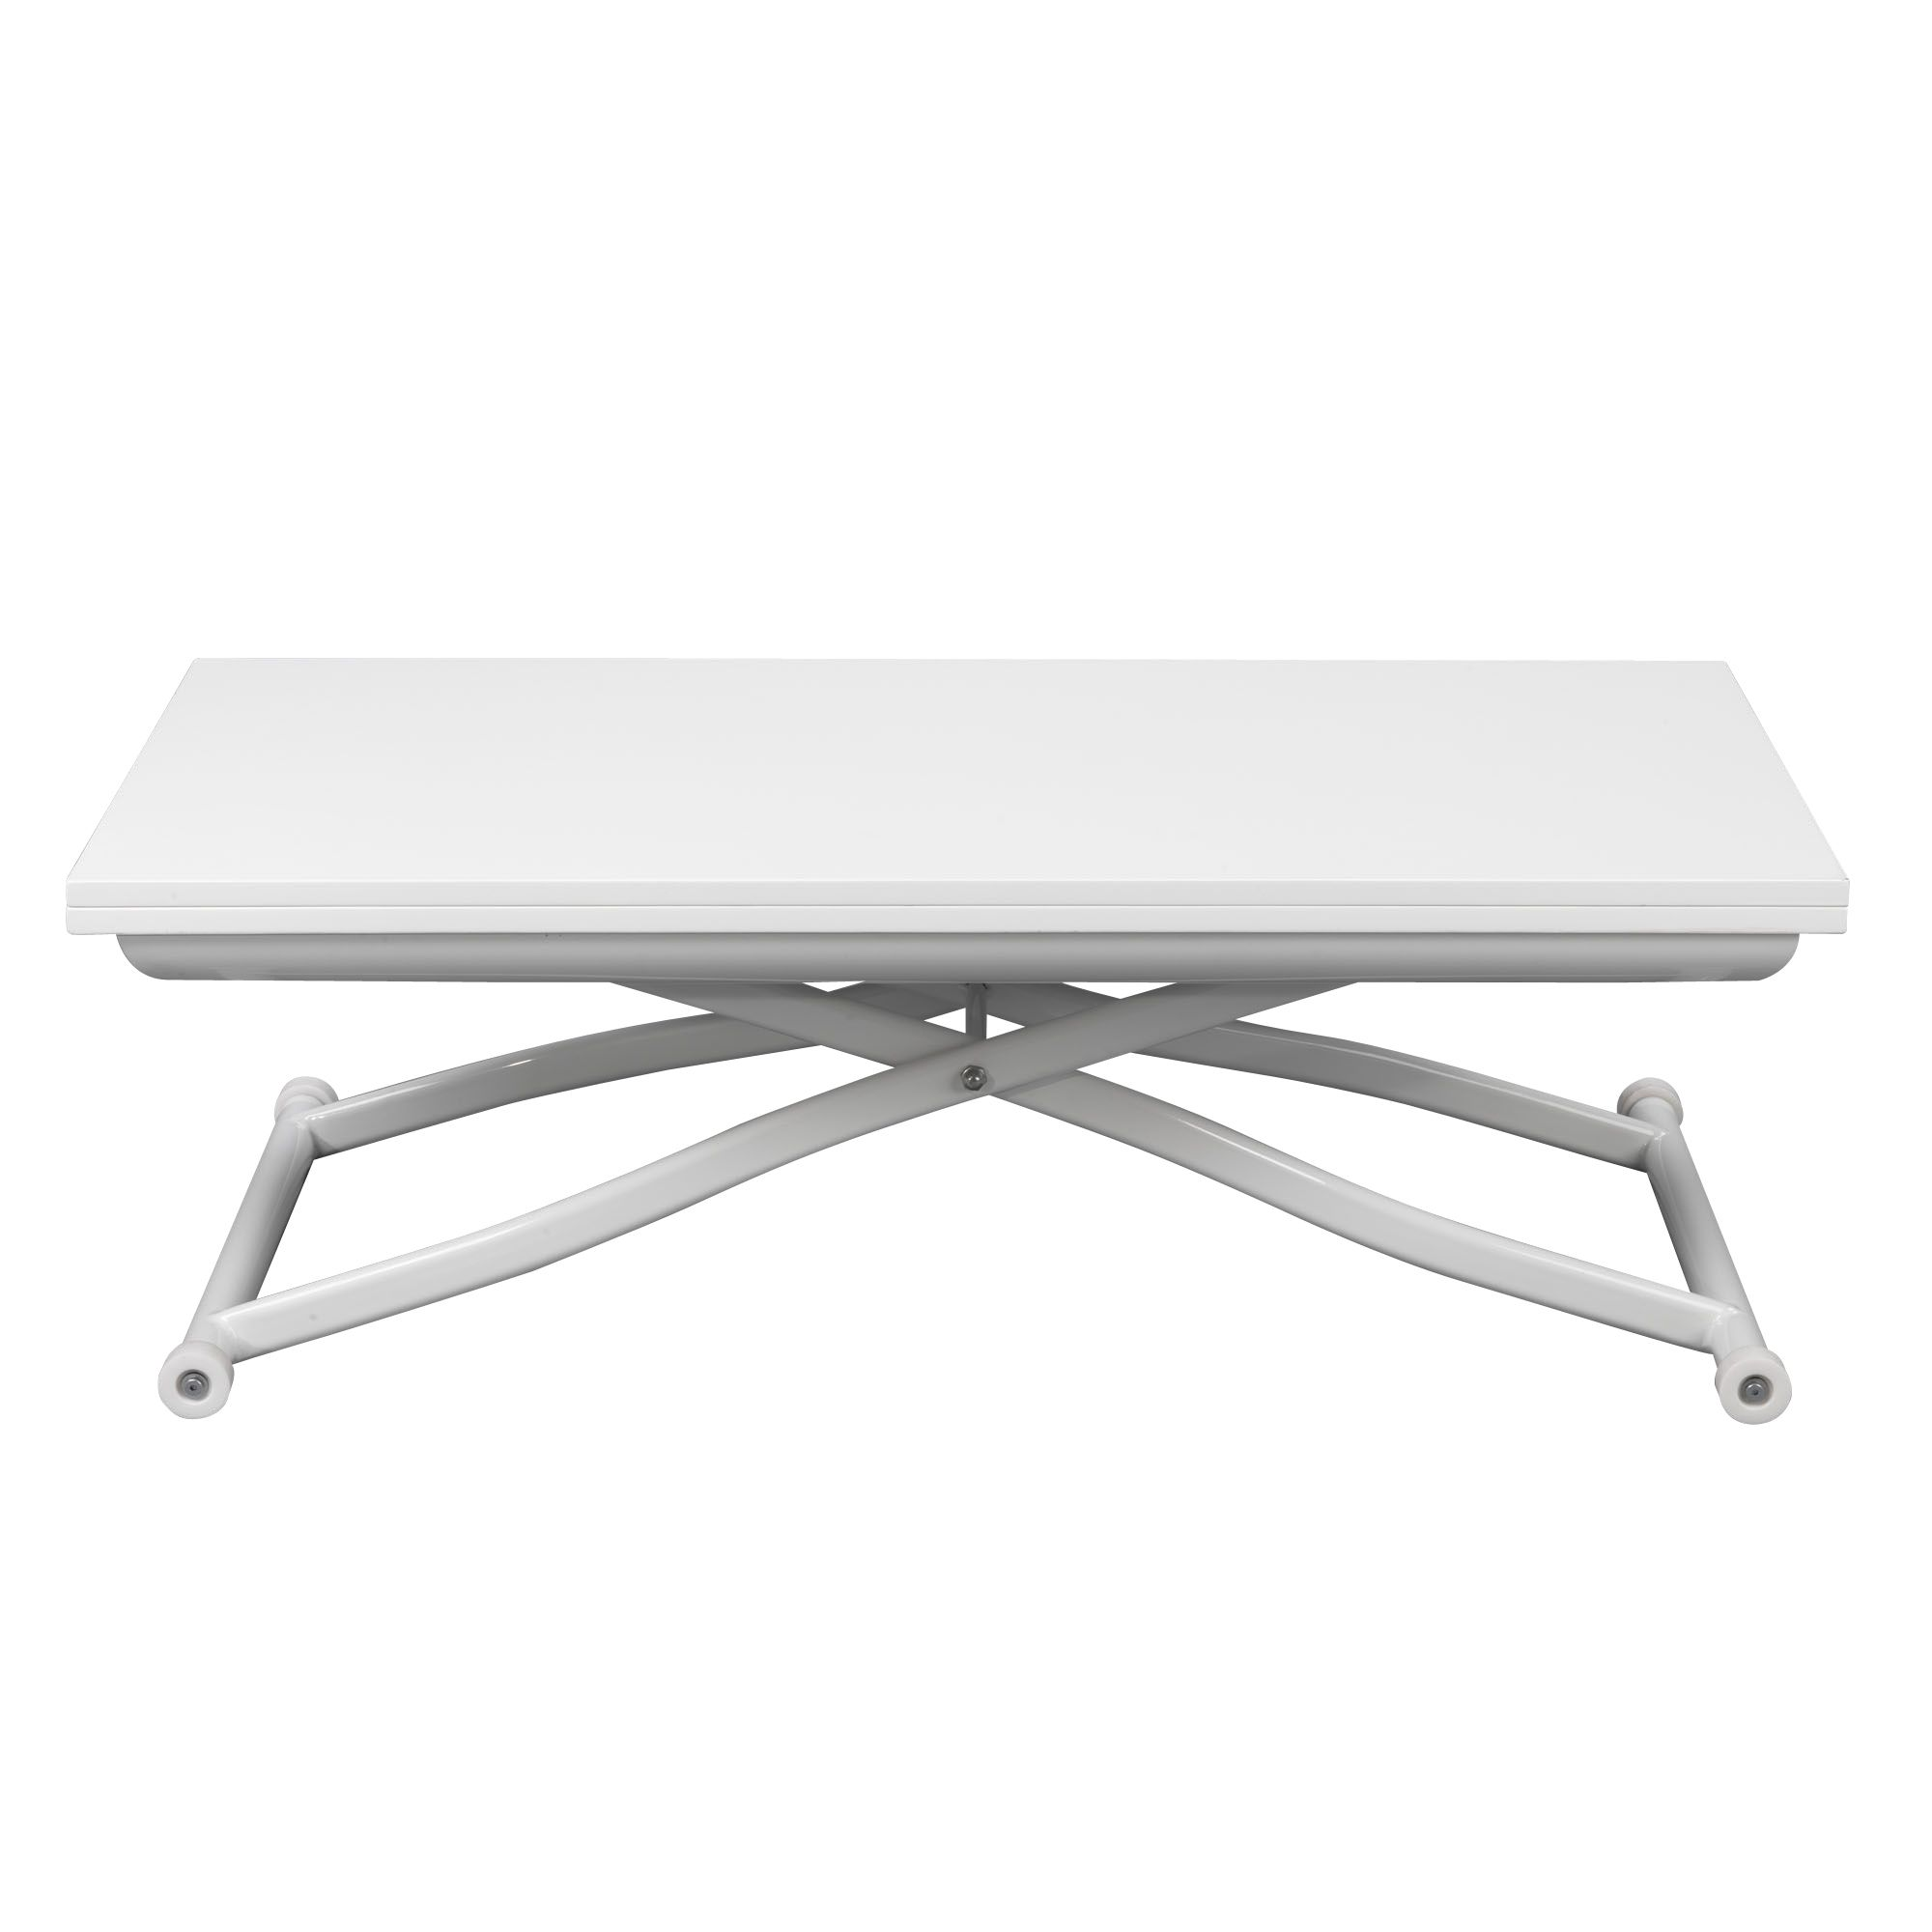 magnC3ADfico table basse modulable relevable conforama